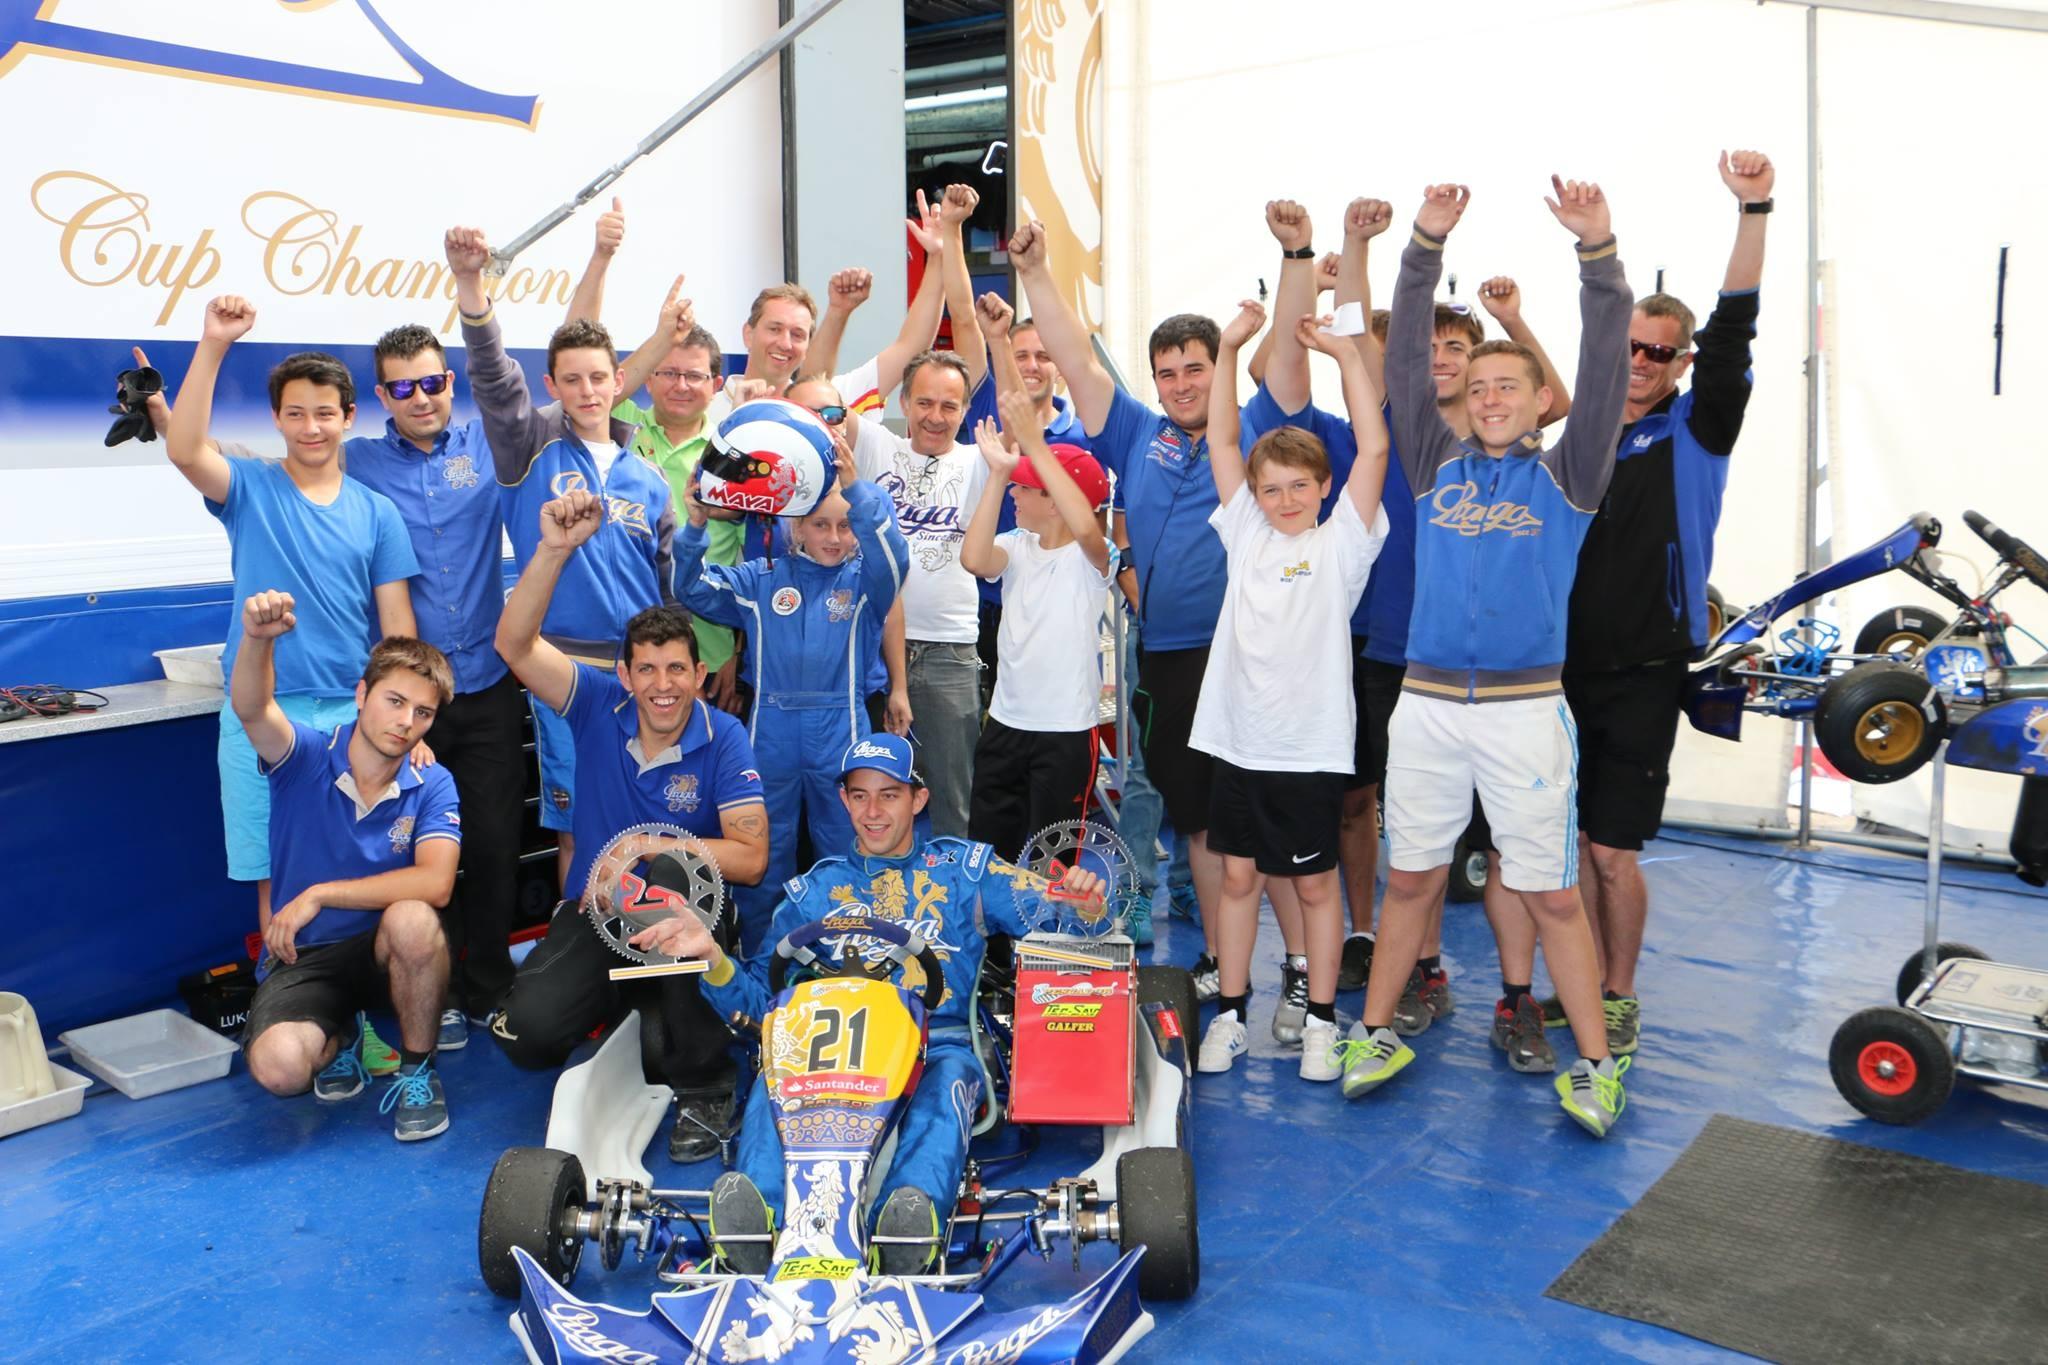 Spain Championship Campillos 1st round Praga won in KZ2 category